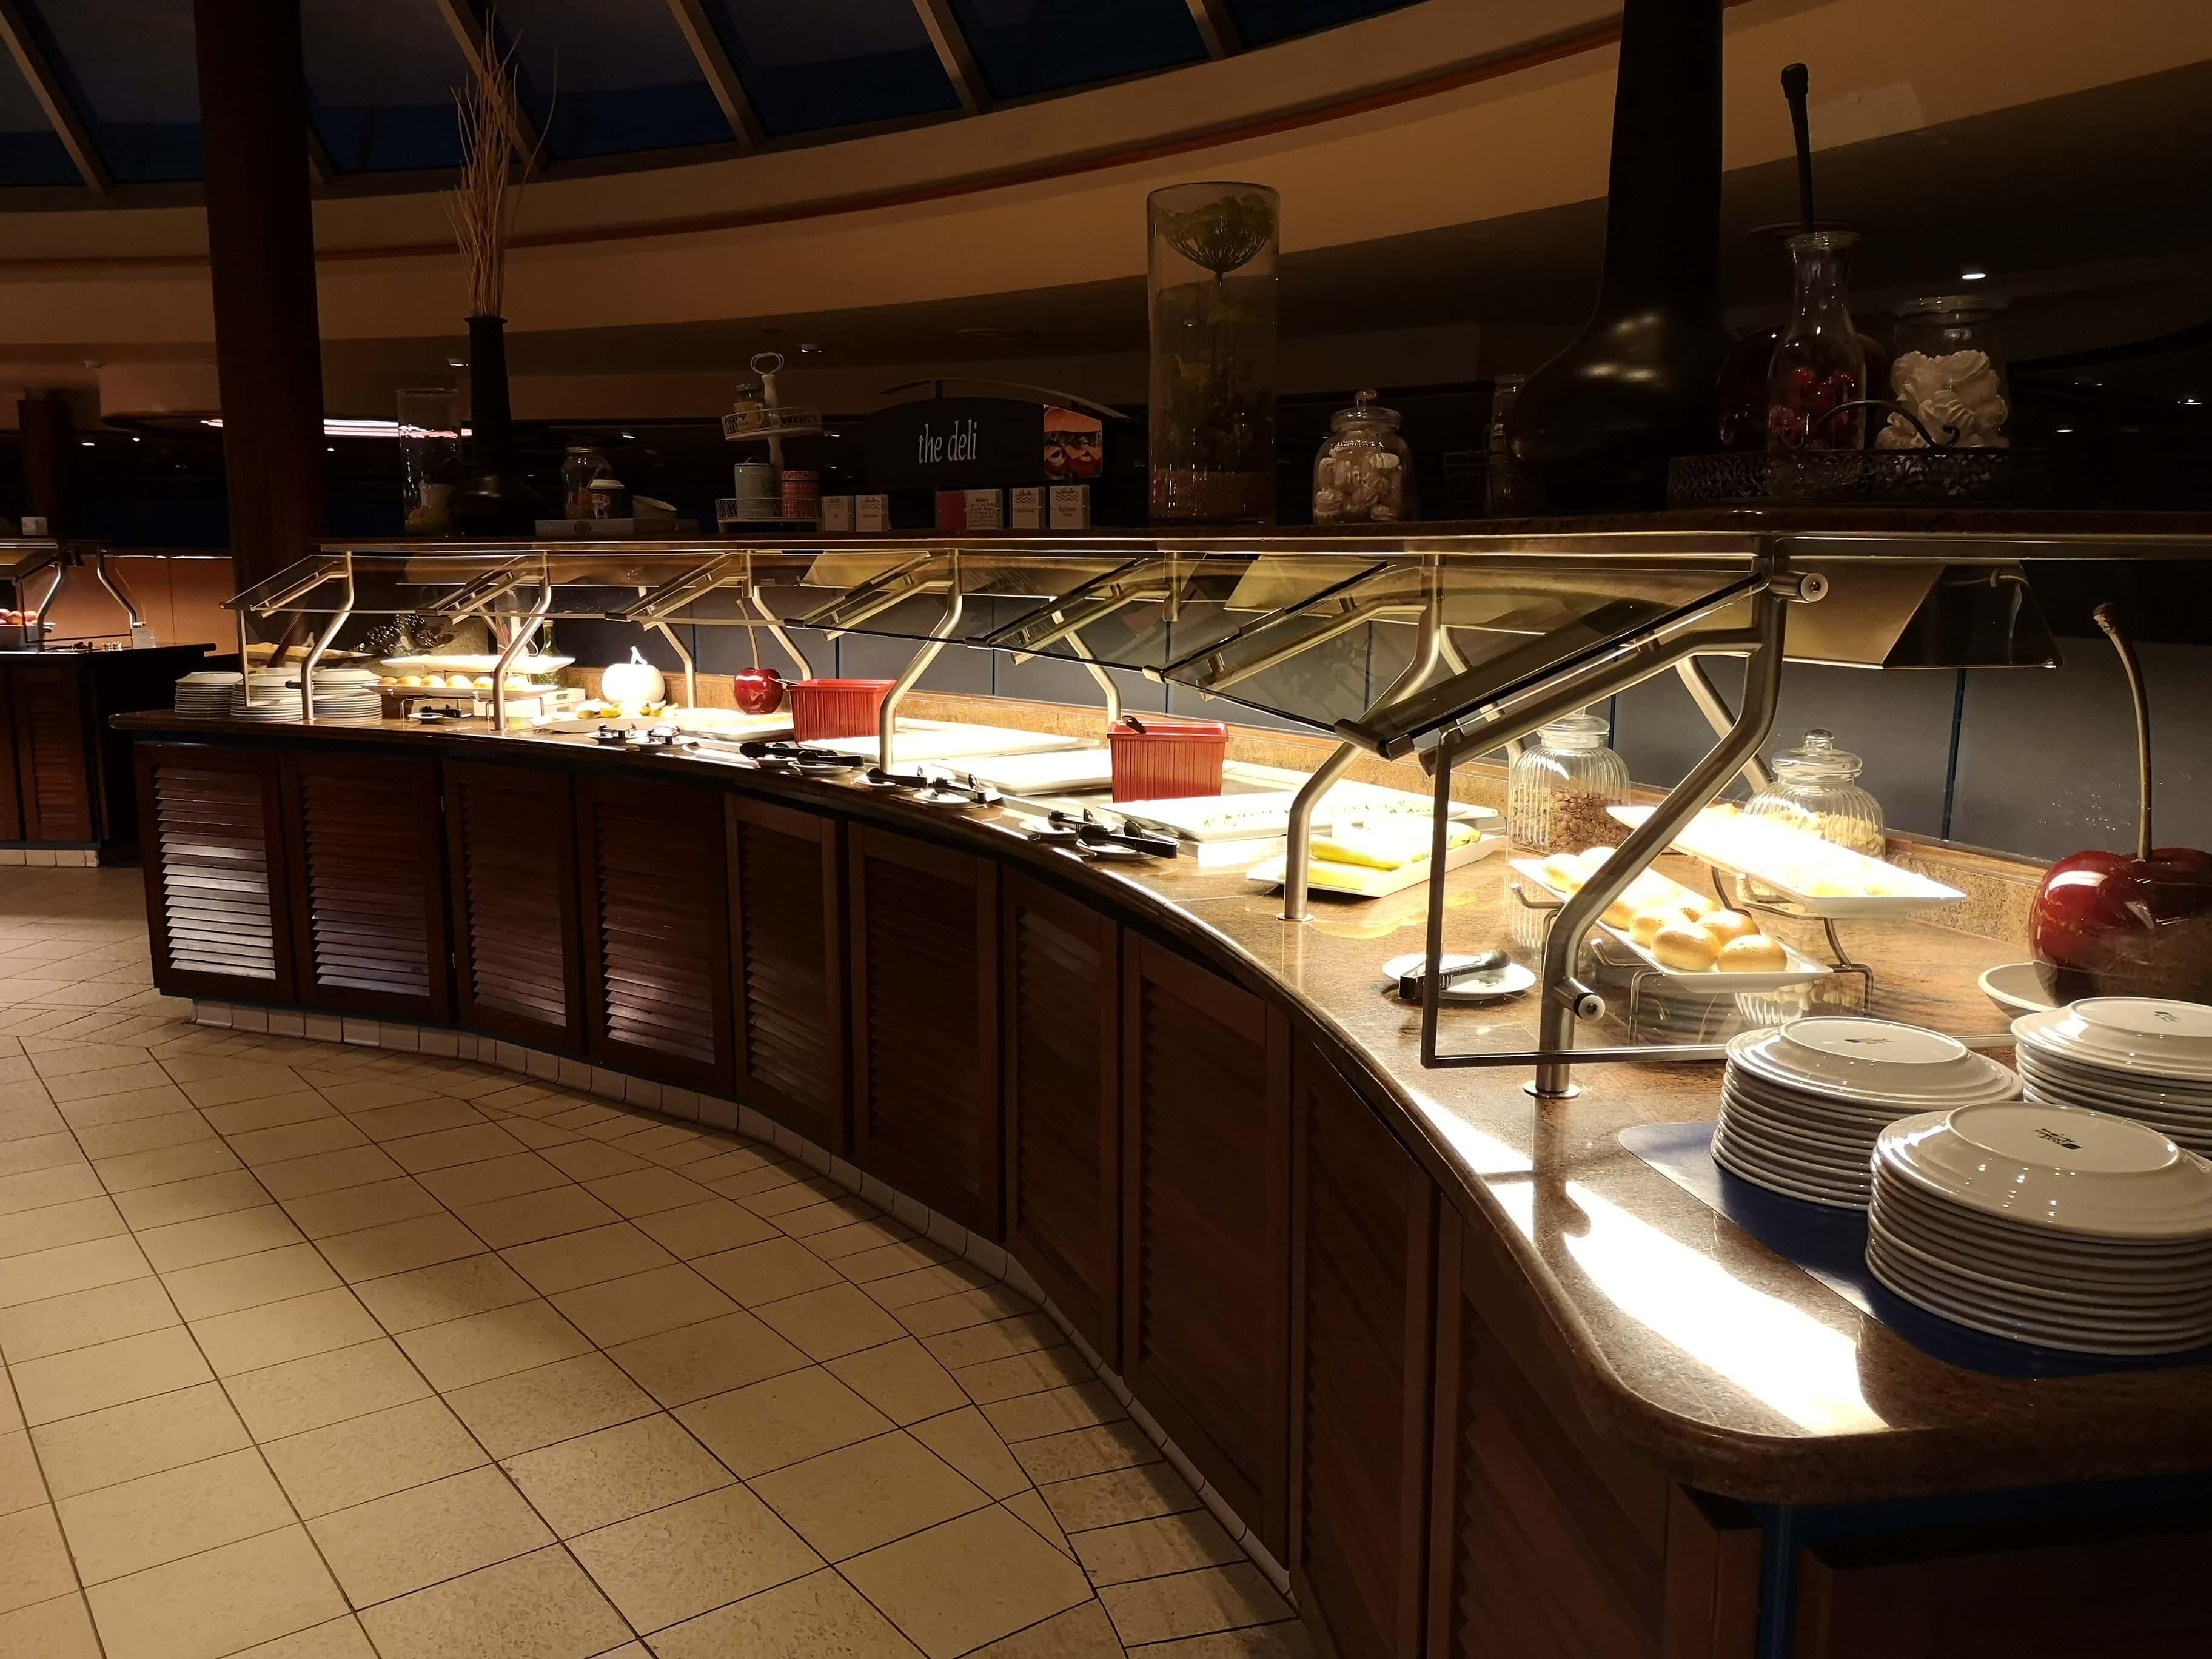 Marella Discovery Buffet food